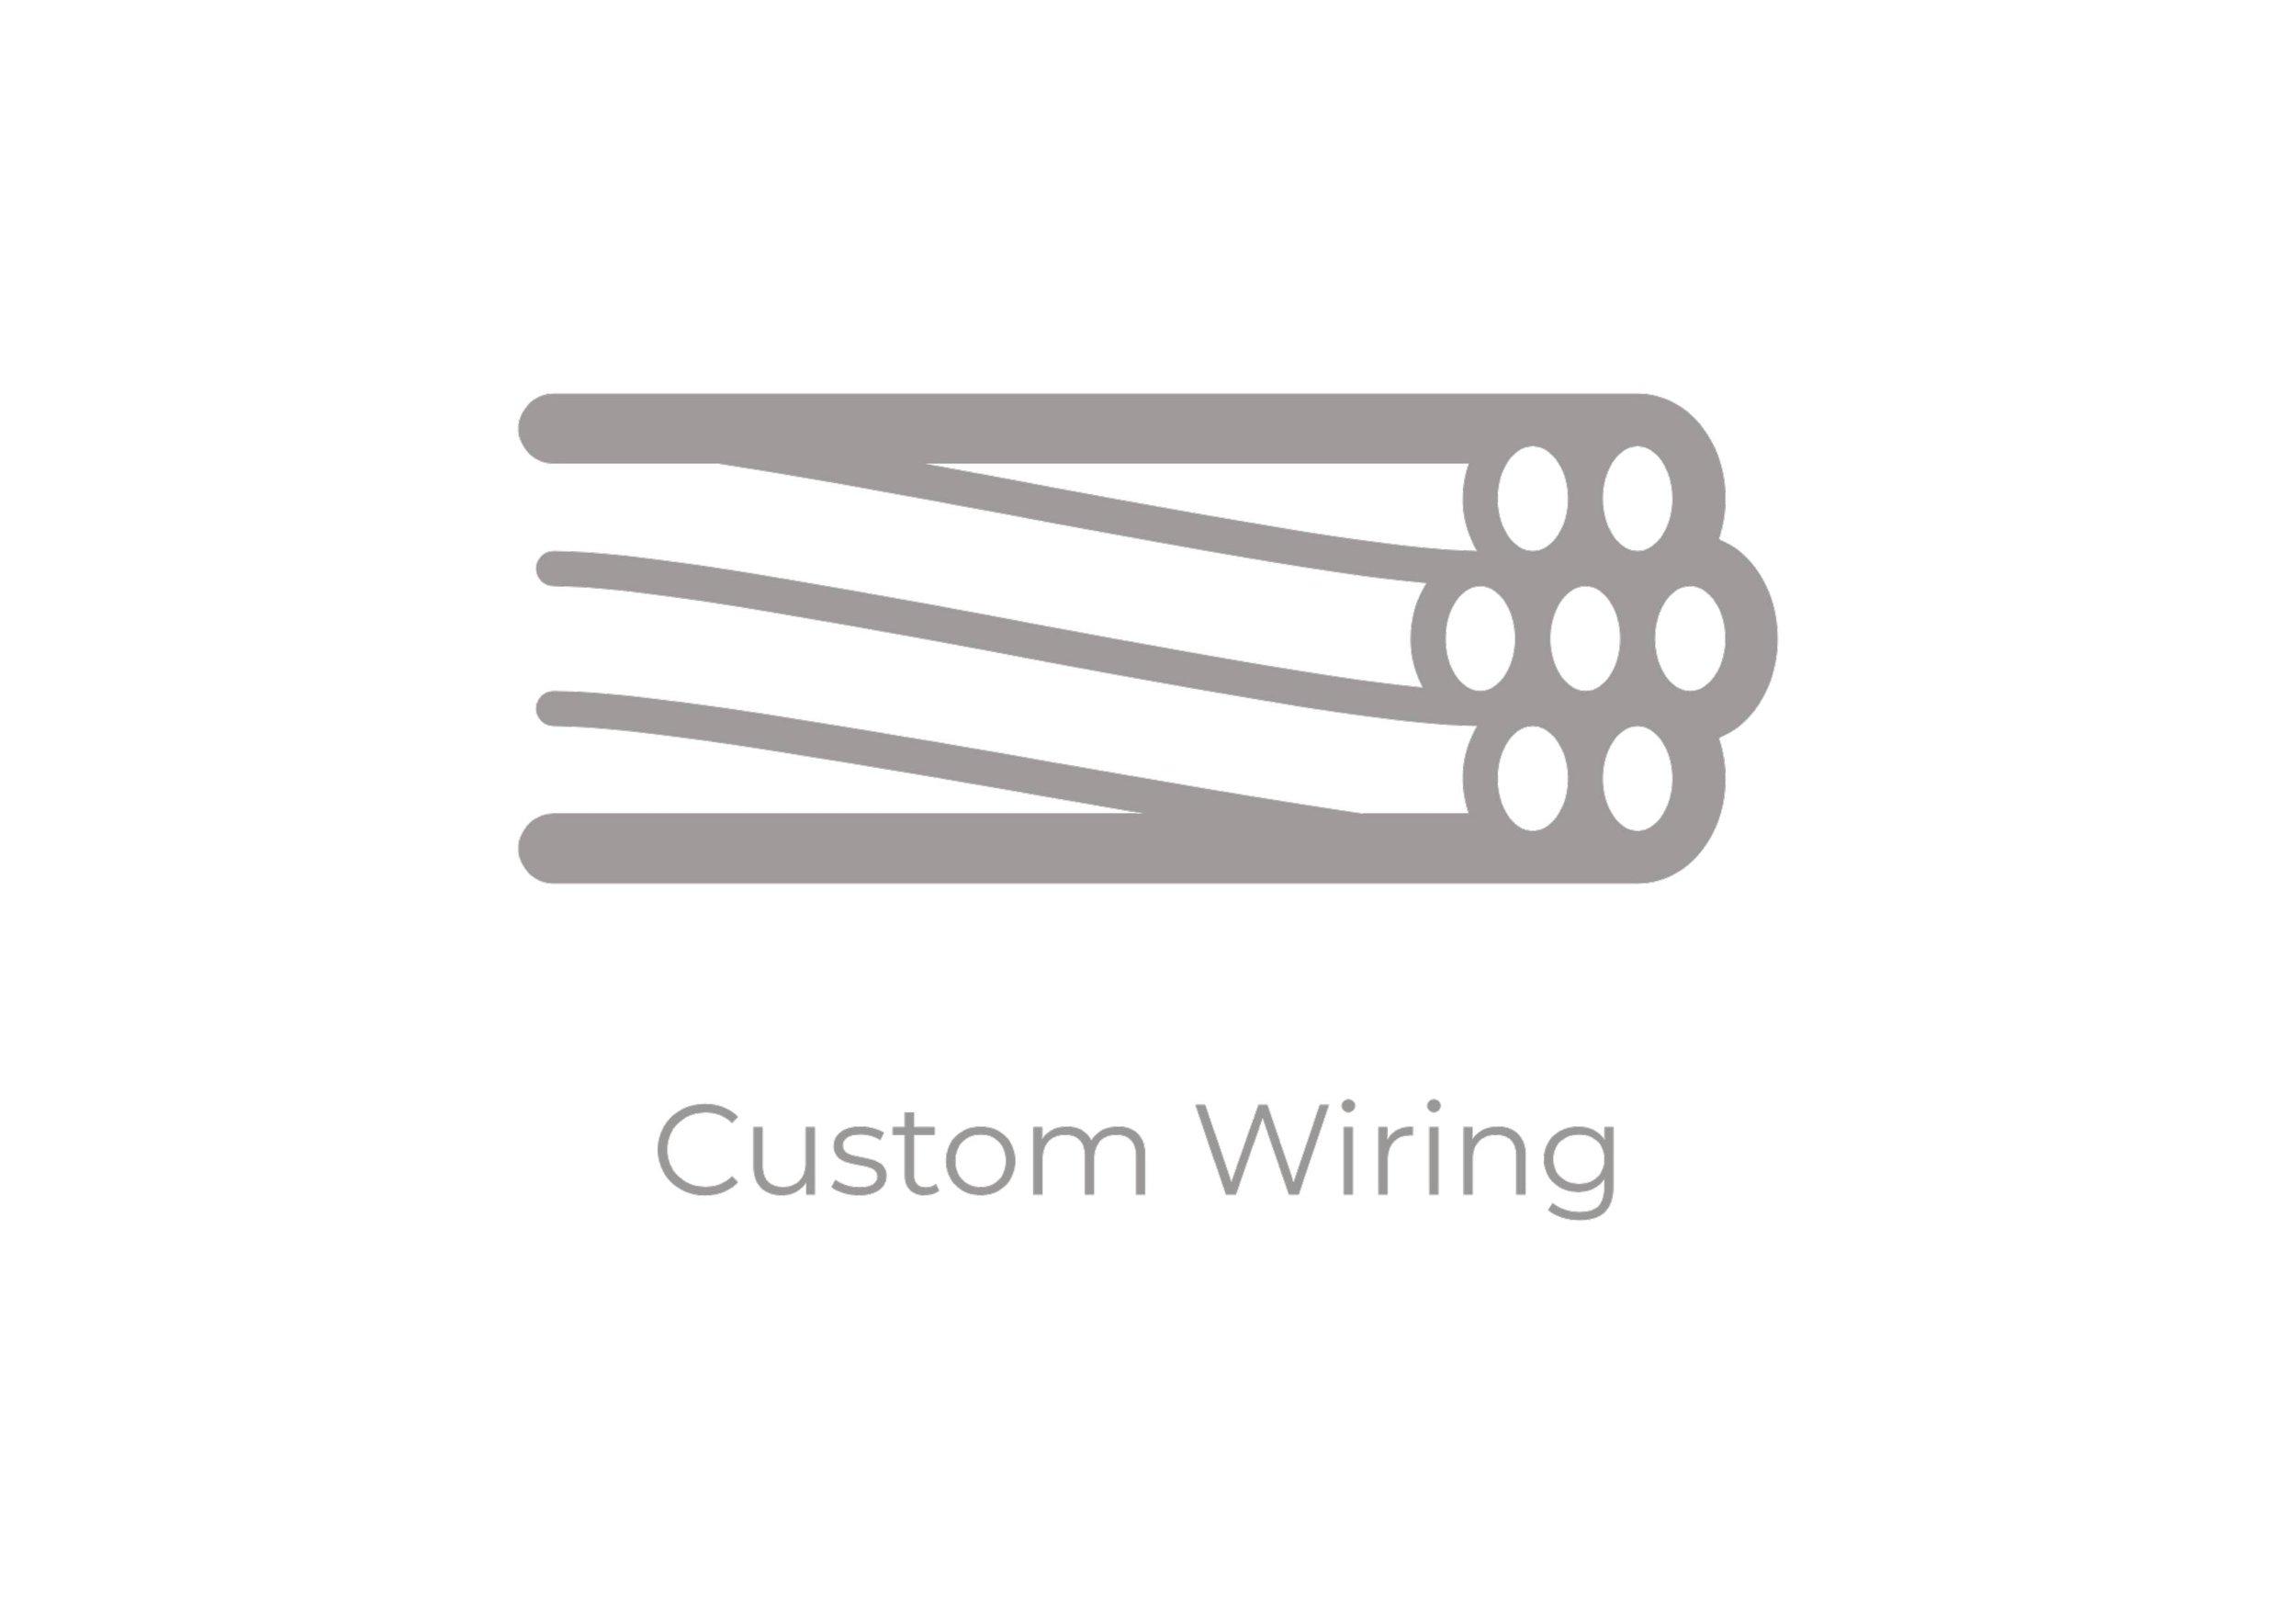 customwiring.jpg